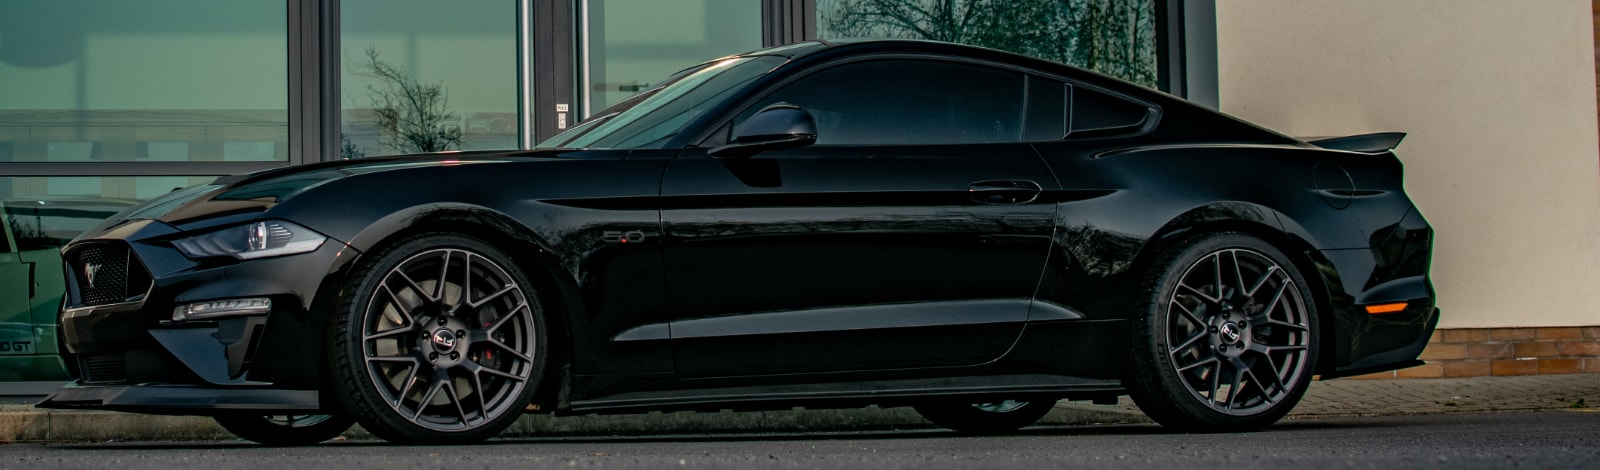 Mustang Specialist